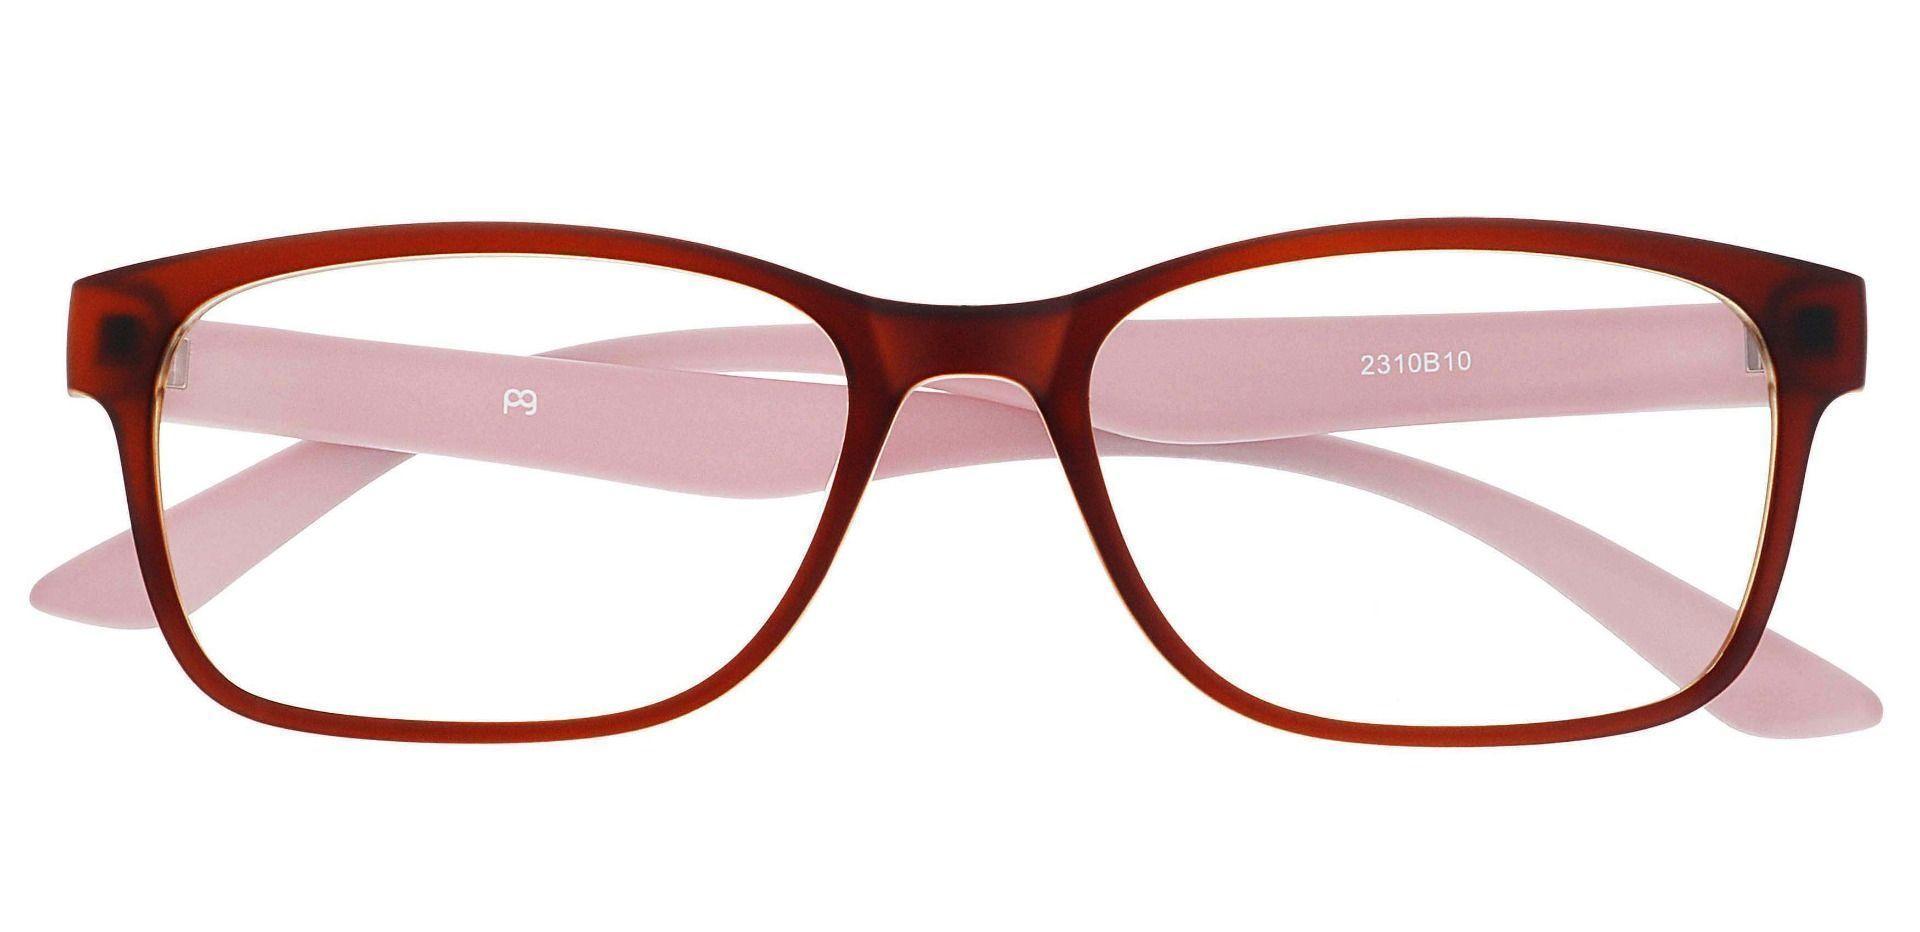 Osmond Rectangle Prescription Glasses - Matte Brown Pink